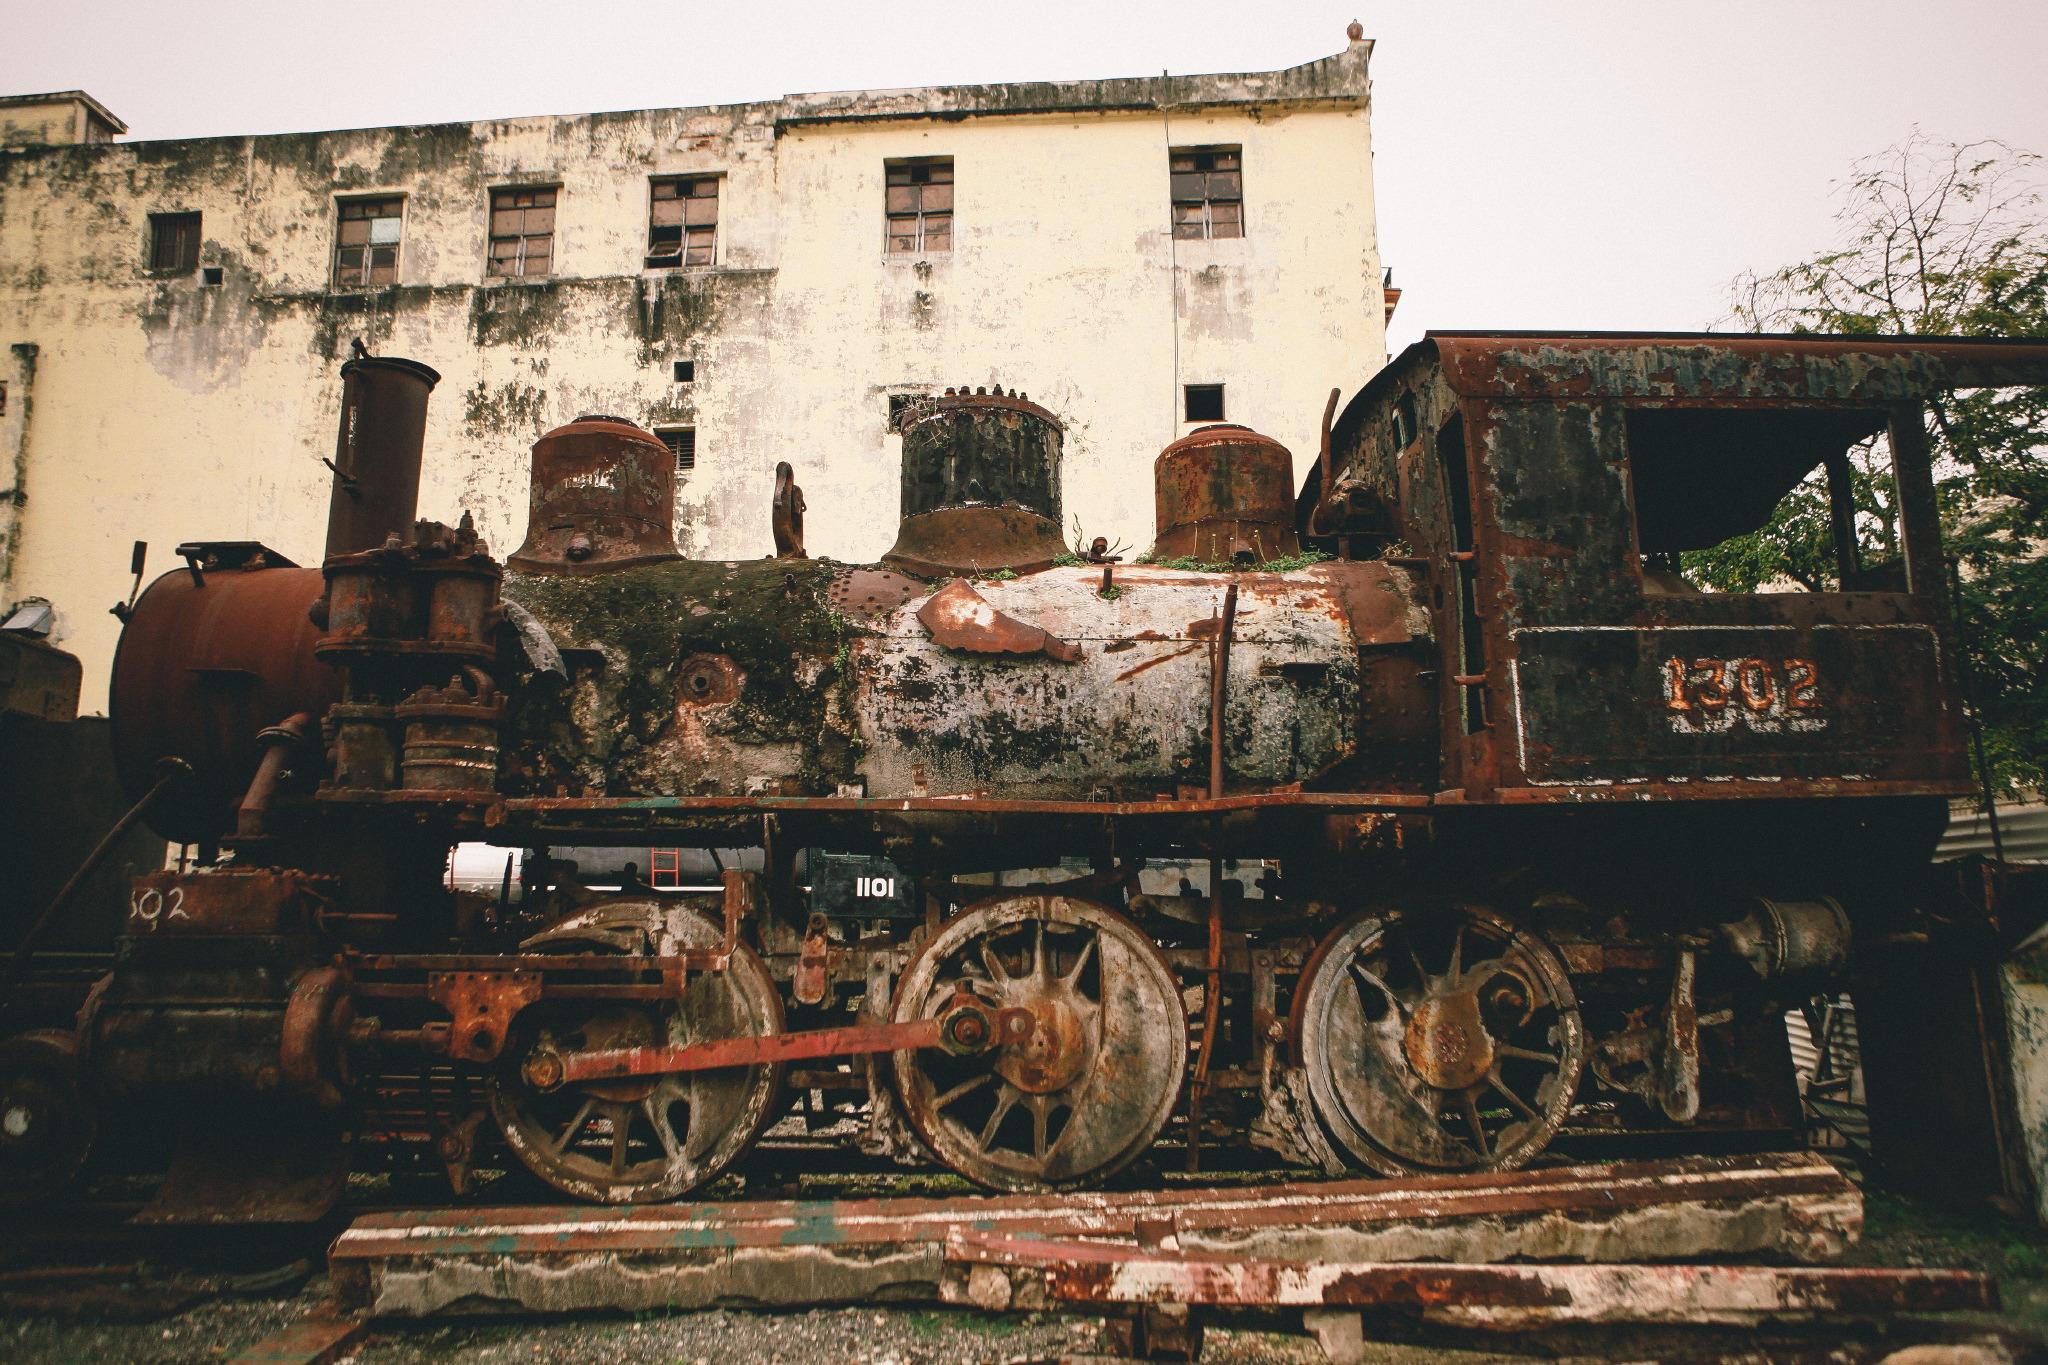 san diego wedding   photographer | old rusted train on display